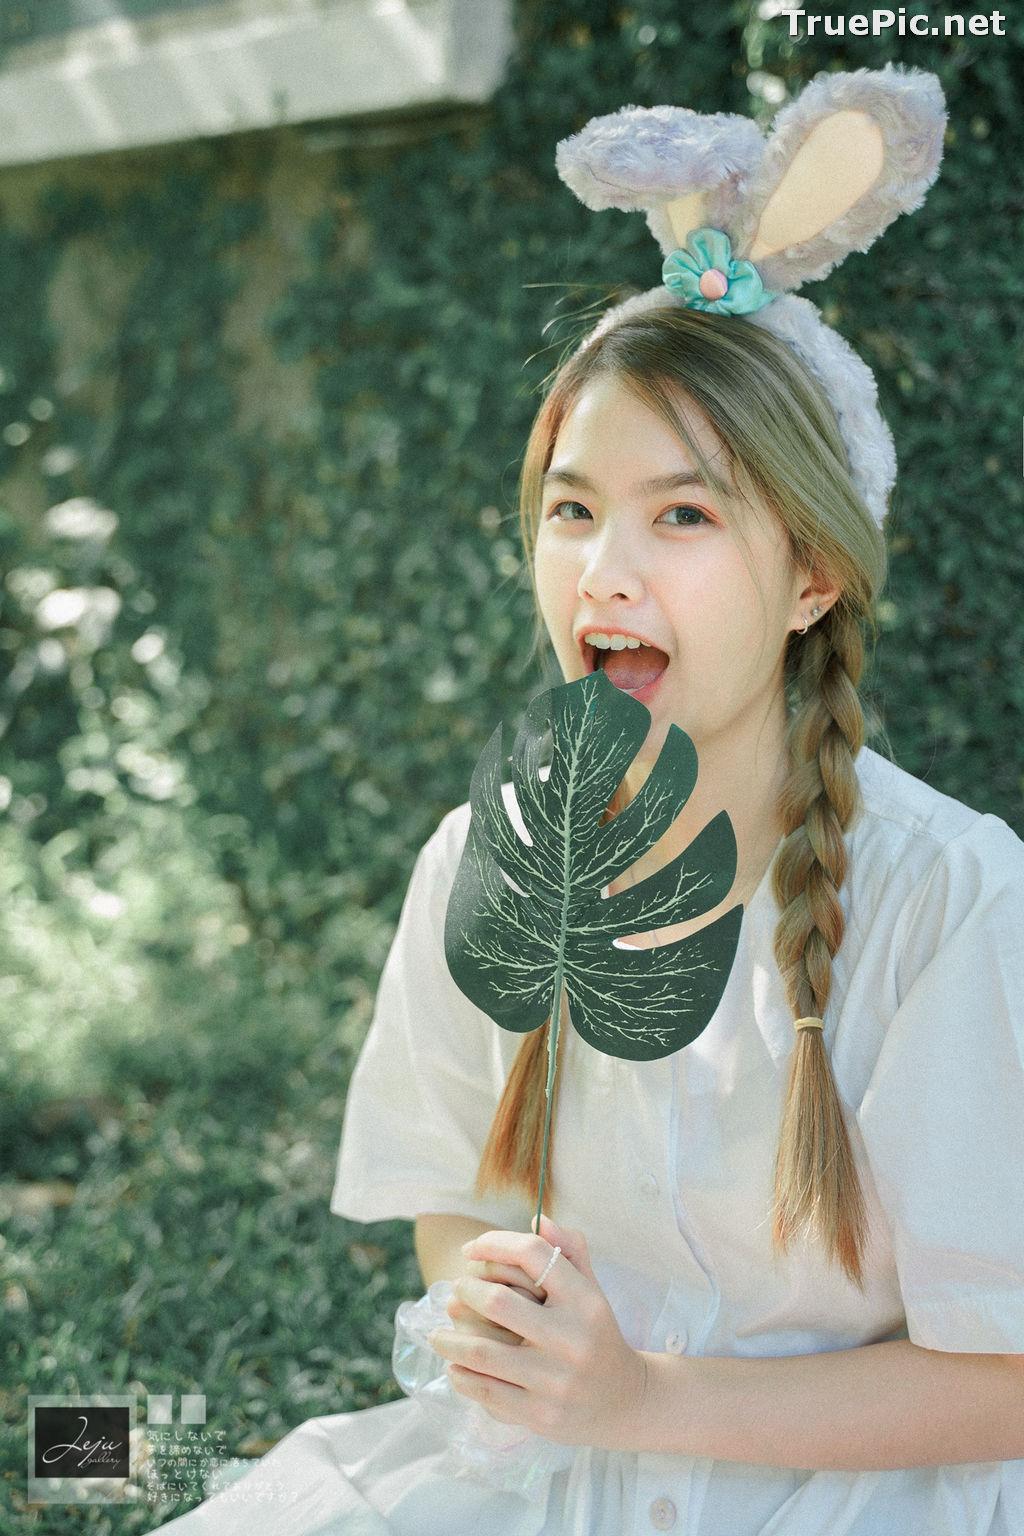 Image Thailand Cute Model - Napat Cdhg - Gam Bunny Girl - TruePic.net - Picture-8